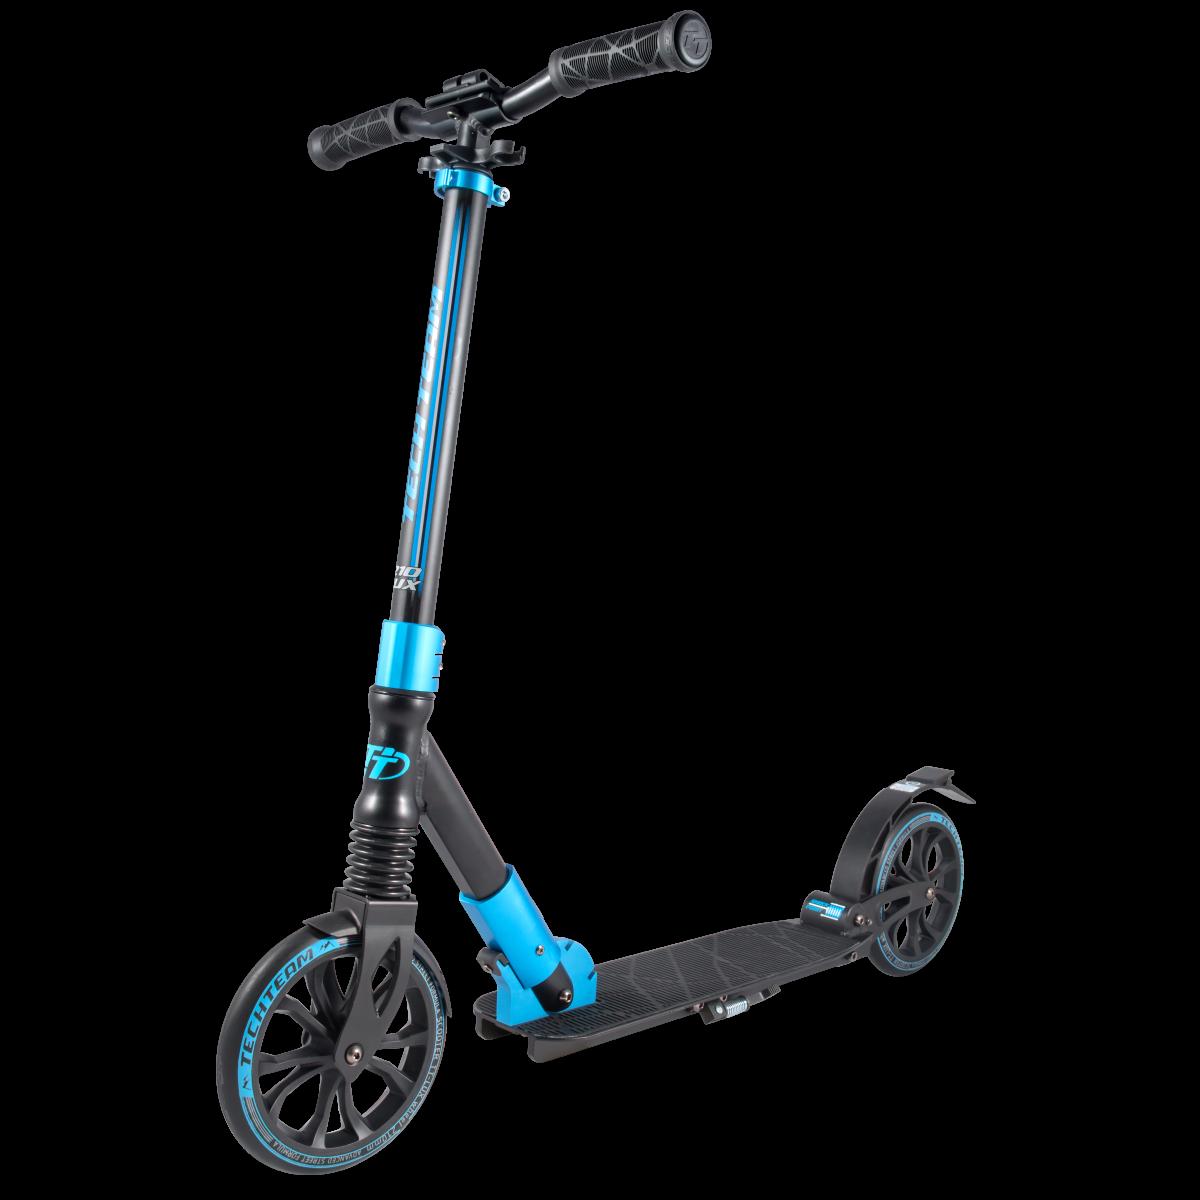 Самокат TechTeam 210 Lux 2019 синий